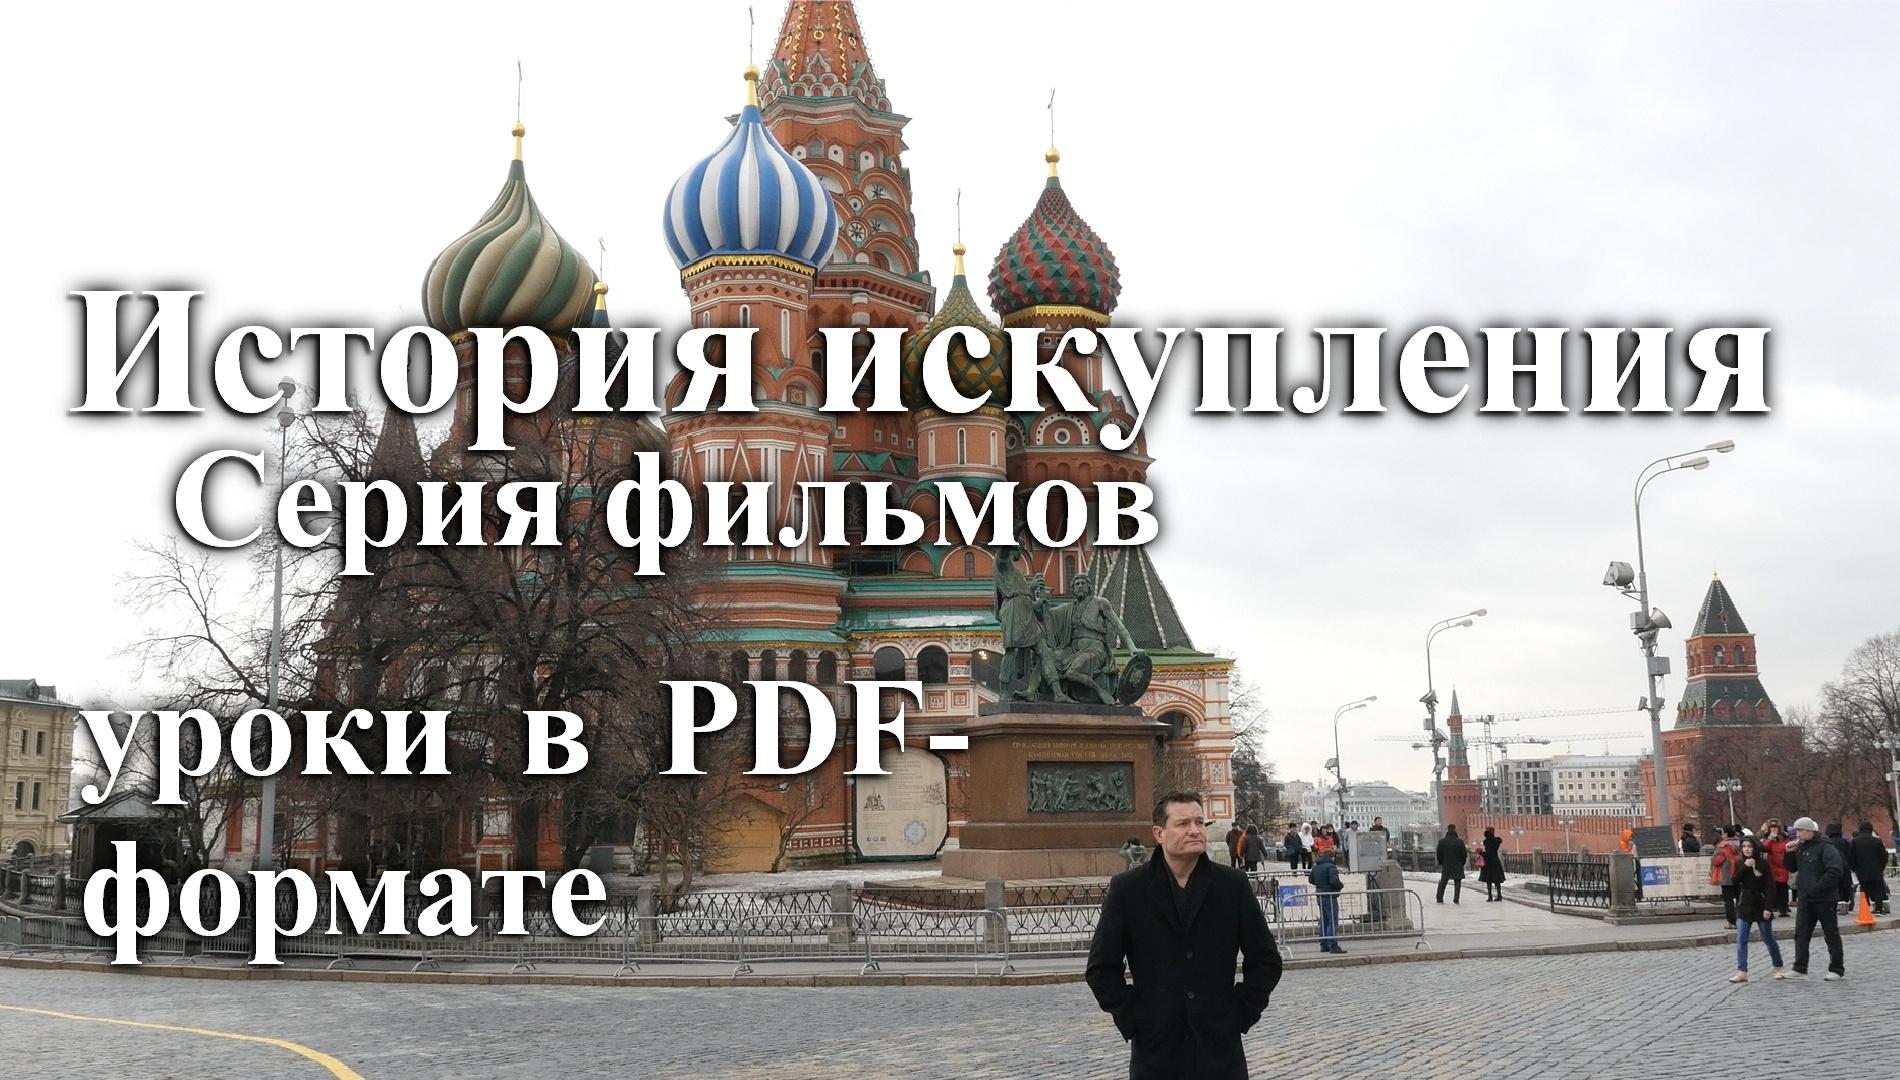 Ccfttpsqtl2diwdnircp russian 20sor 20slide 204